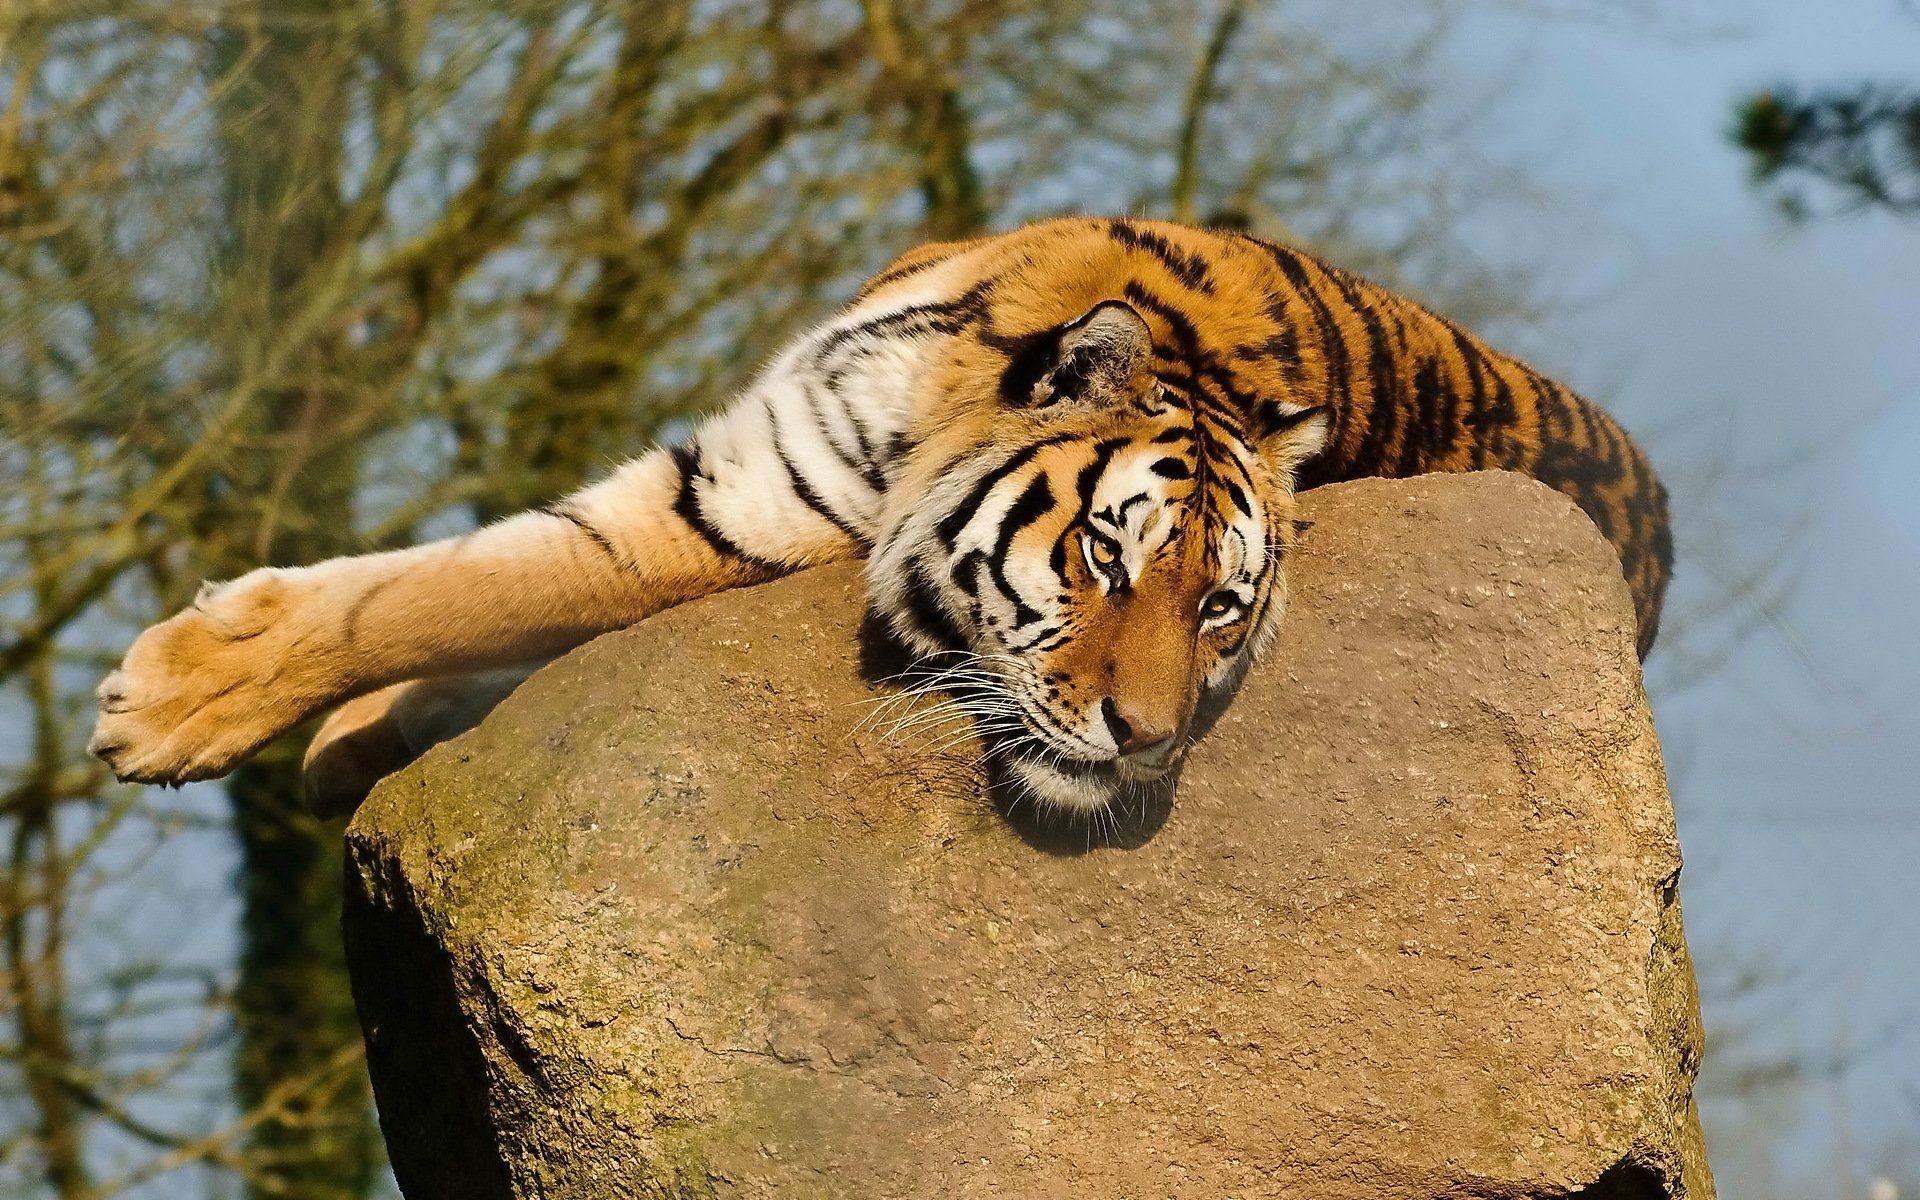 Tiger on stone, Full HD Wallpaper